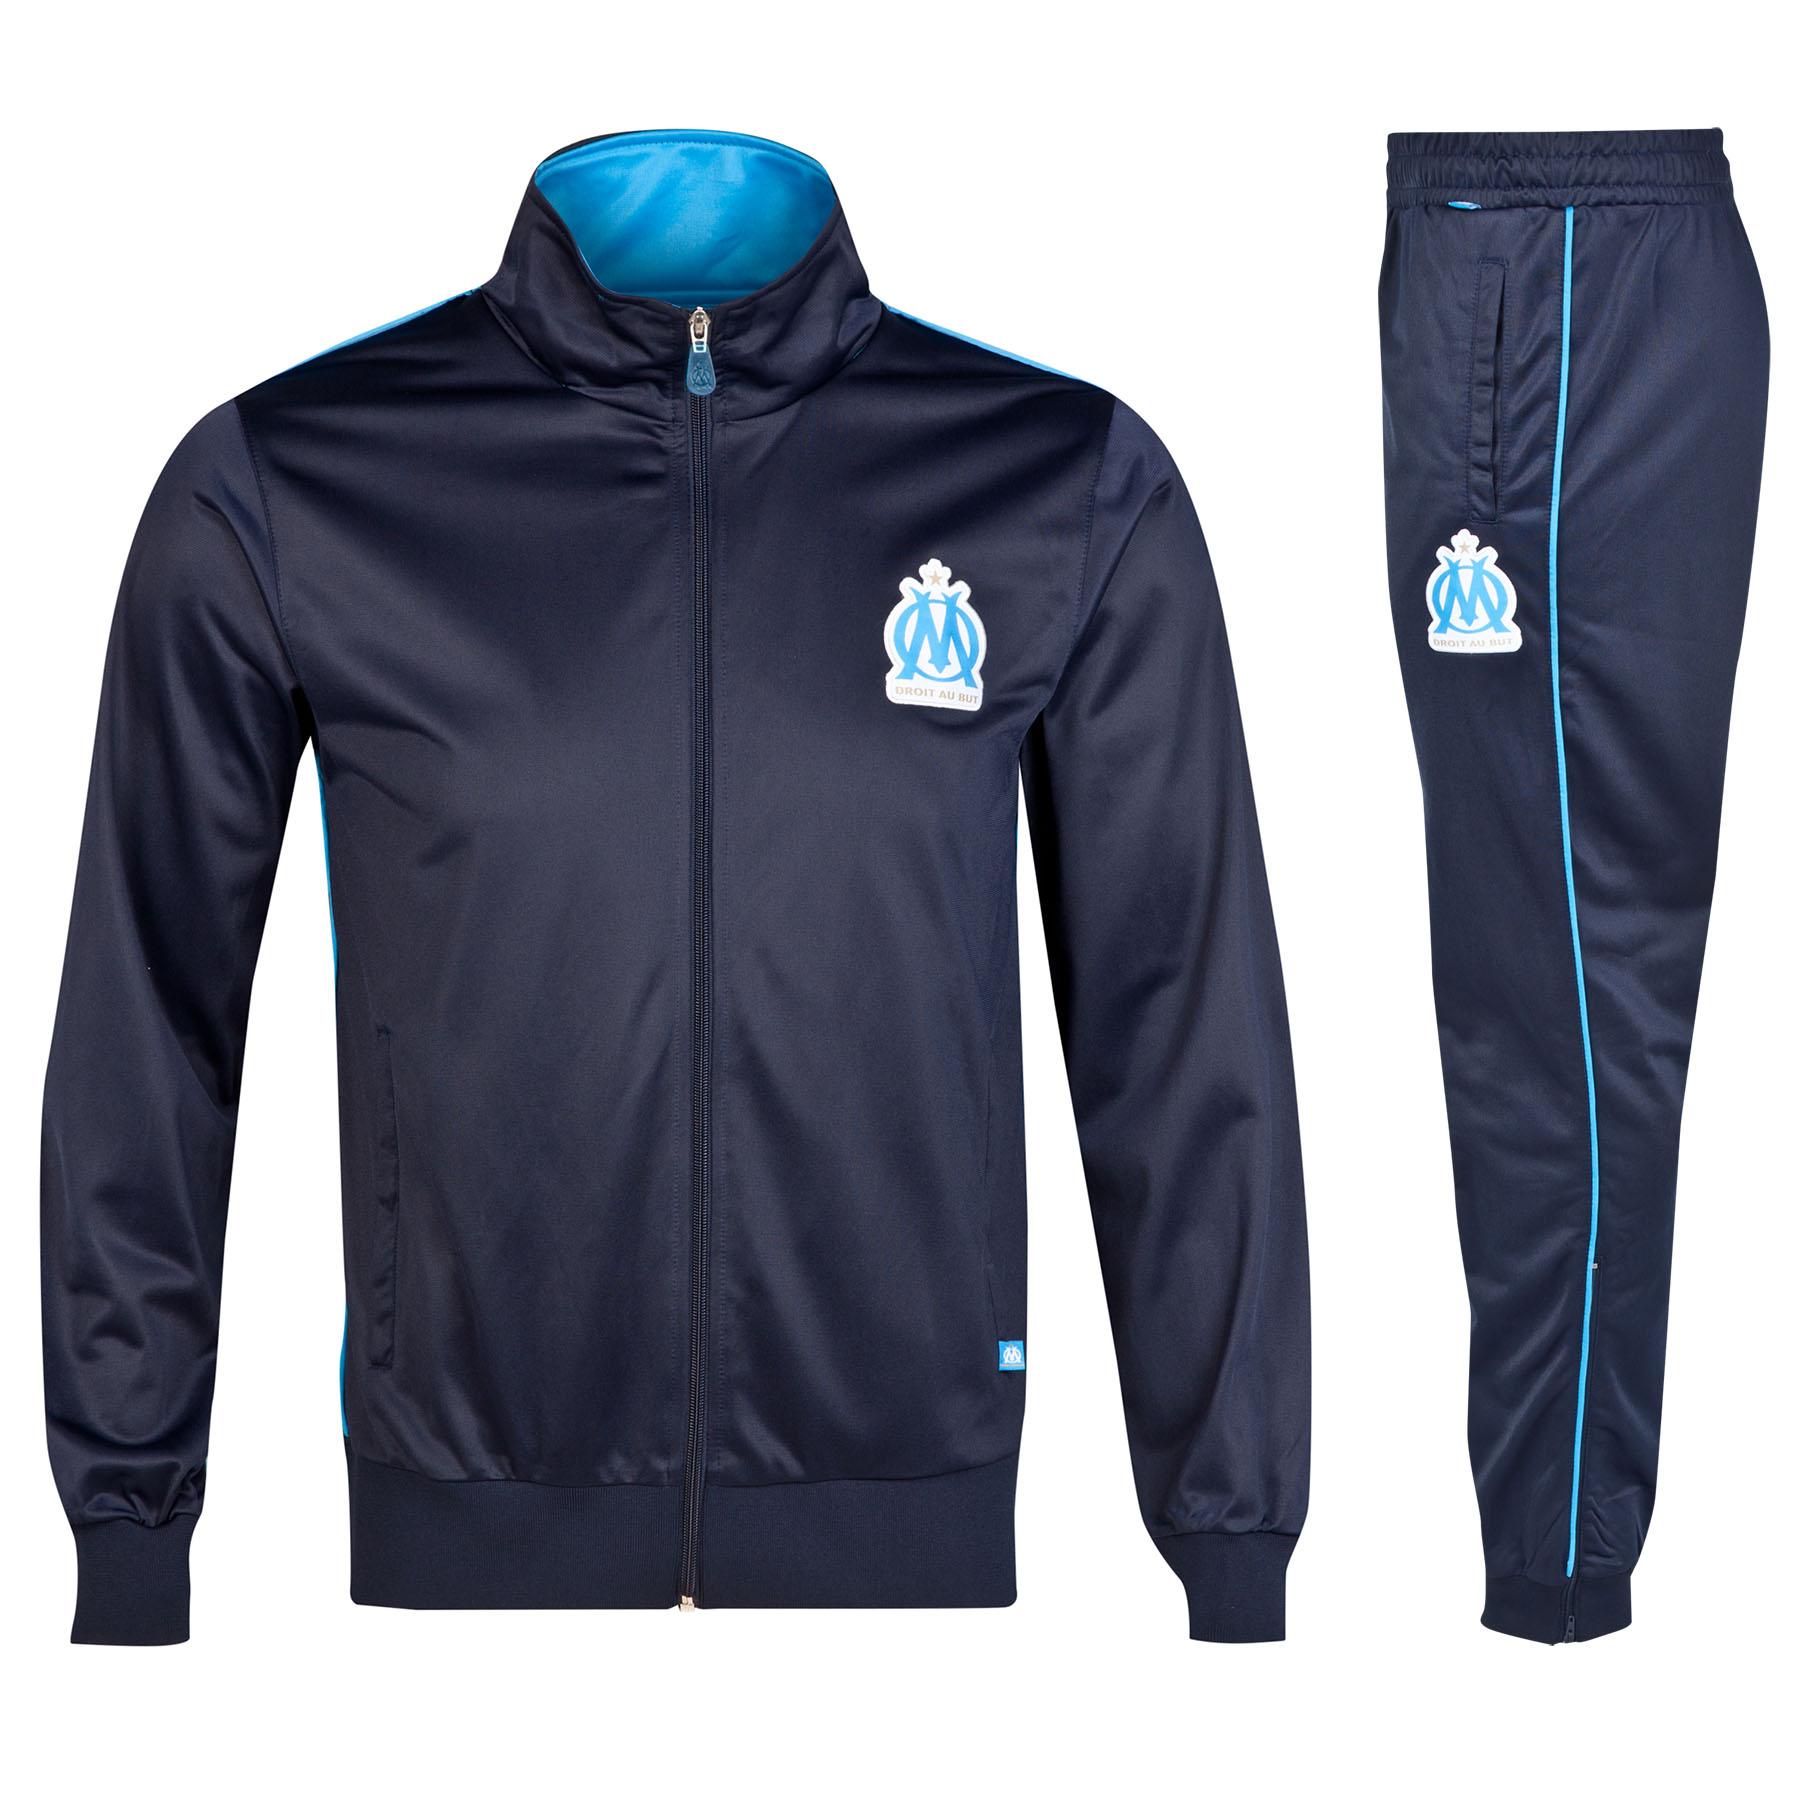 Olympique de Marseille Tracksuit - Marine - Mens